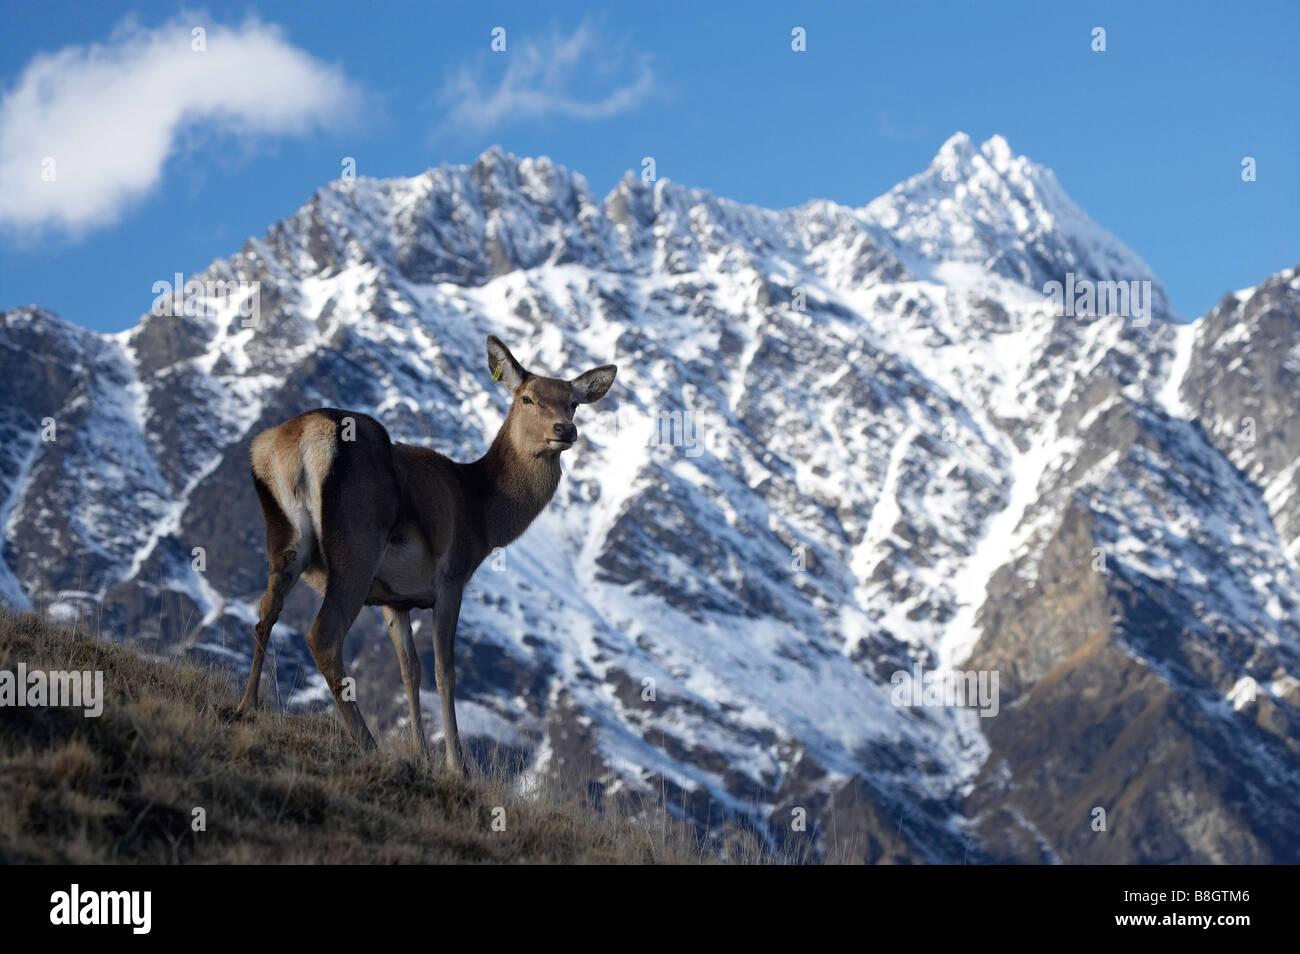 Rothirsch Cervus Elaphus und The Remarkables Deer Park Heights Queenstown Neuseeland Südinsel Stockbild